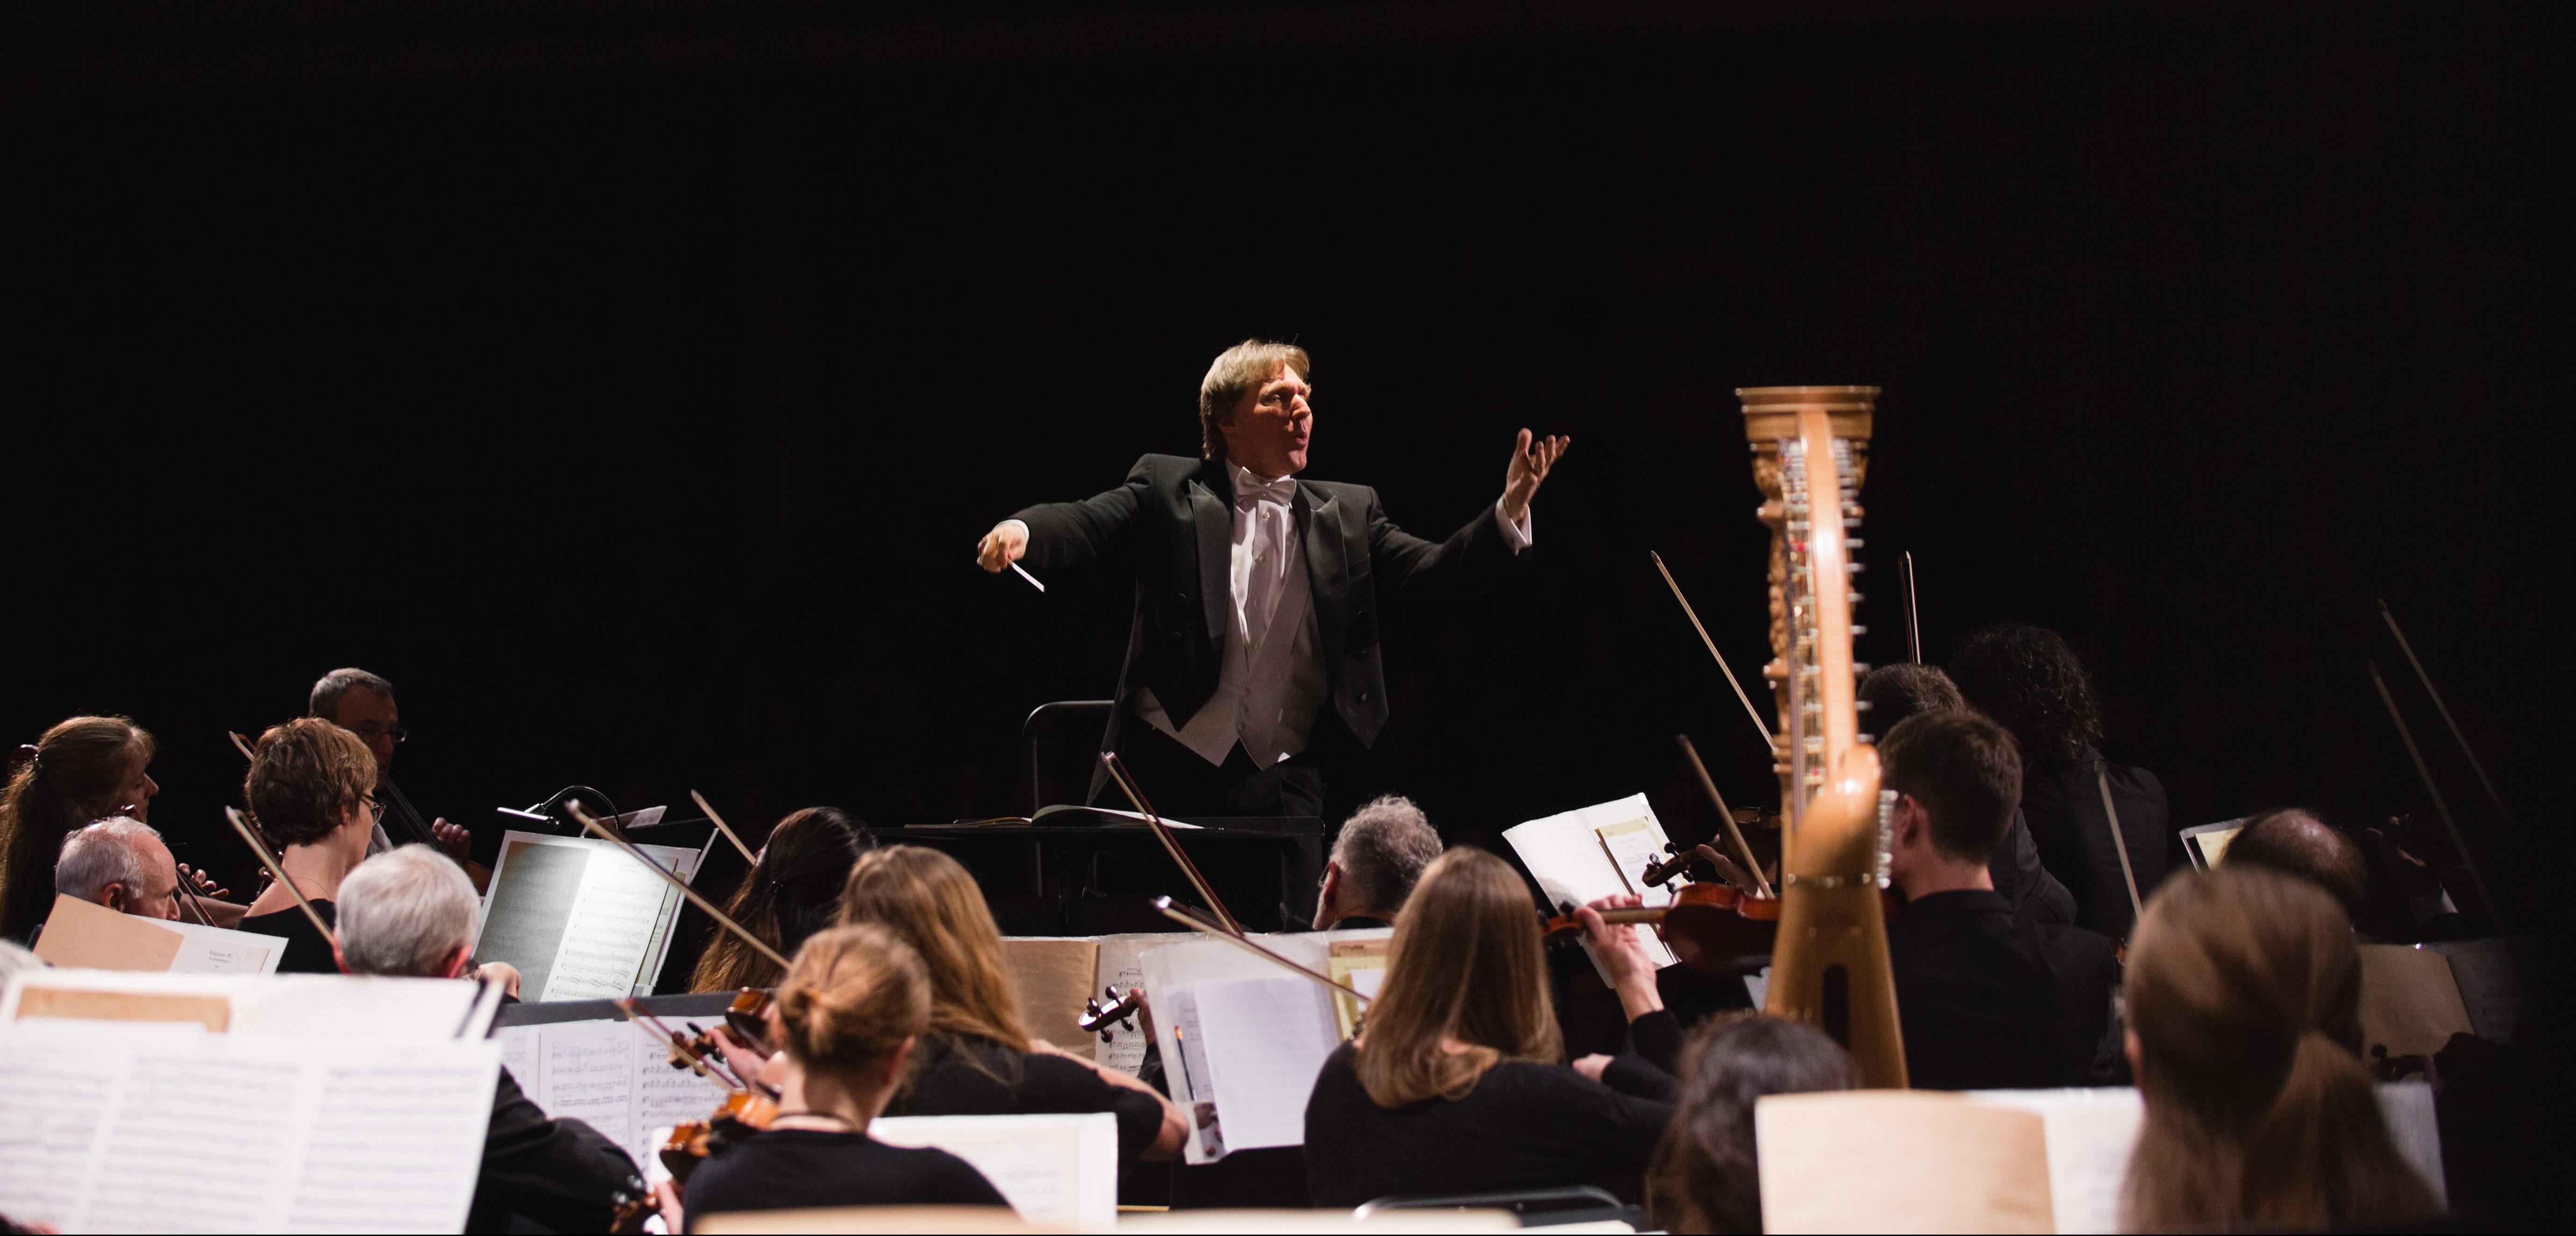 74th Season Premiere Concert, Saturday, October 20, 2018